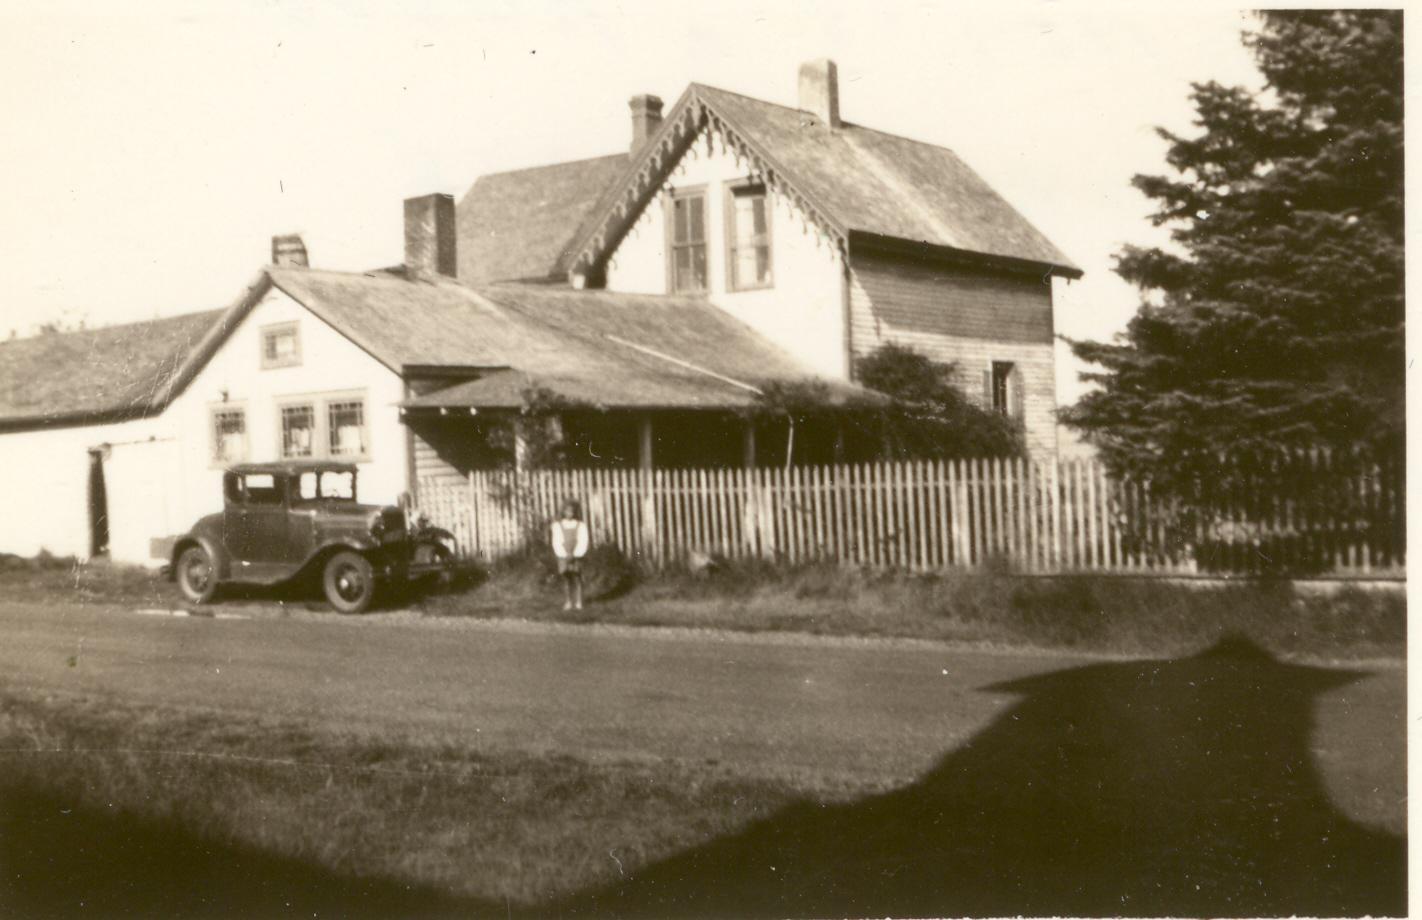 H.A. Espy House 1941